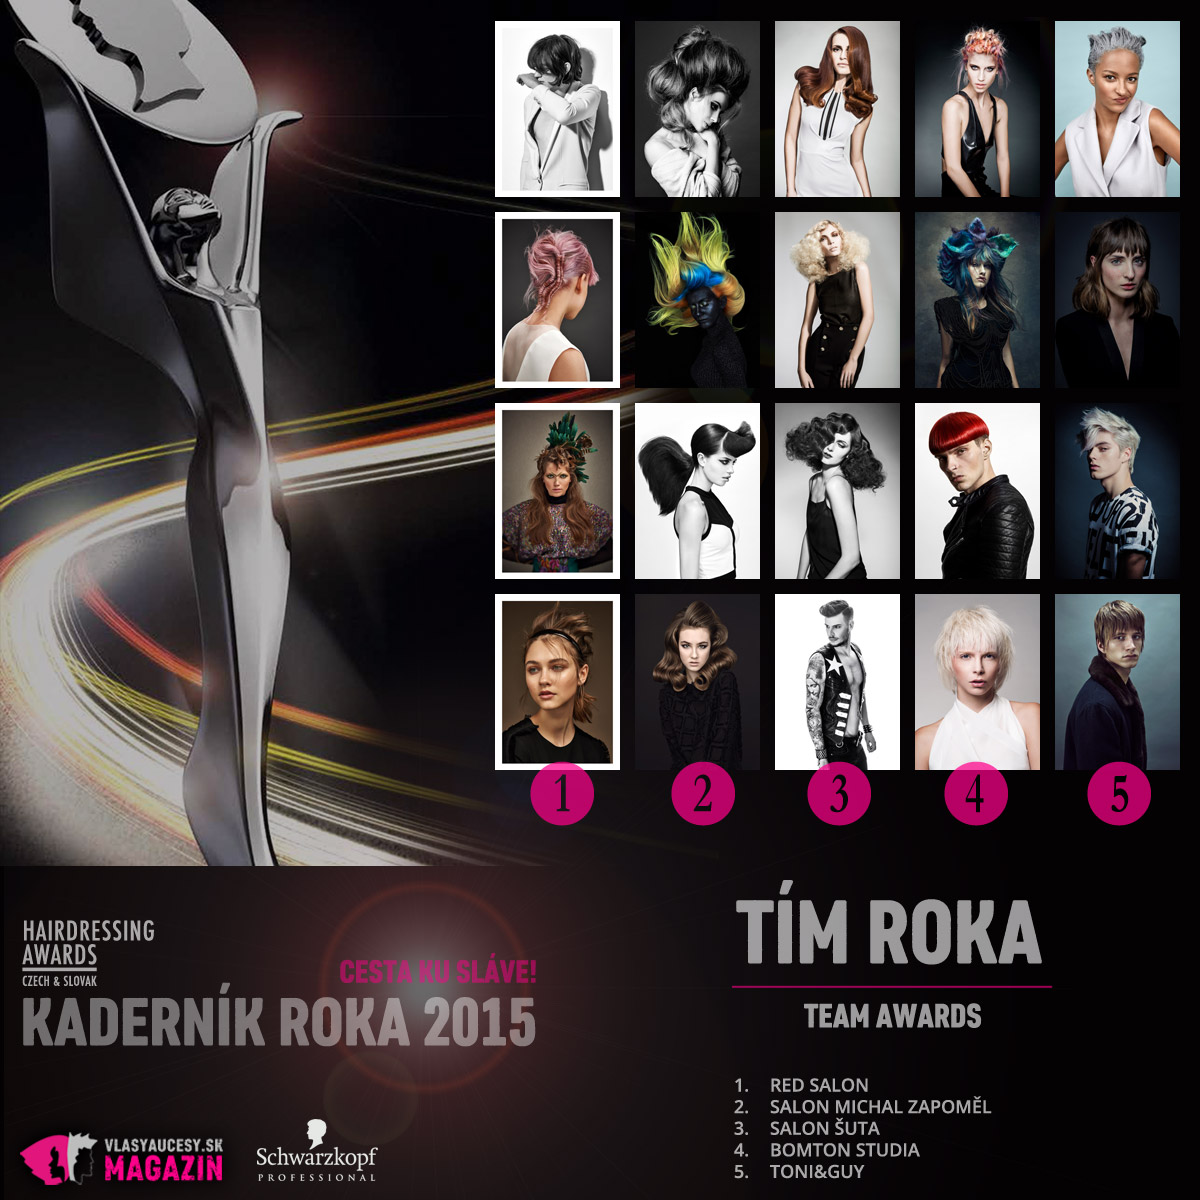 Kaderník roka 2015 – kategória Tím roka / Team Awards (RED Salon, Salon Michal Zapoměl, Salon ŠUTA, Bomton Štúdiá, Toni & Guy).